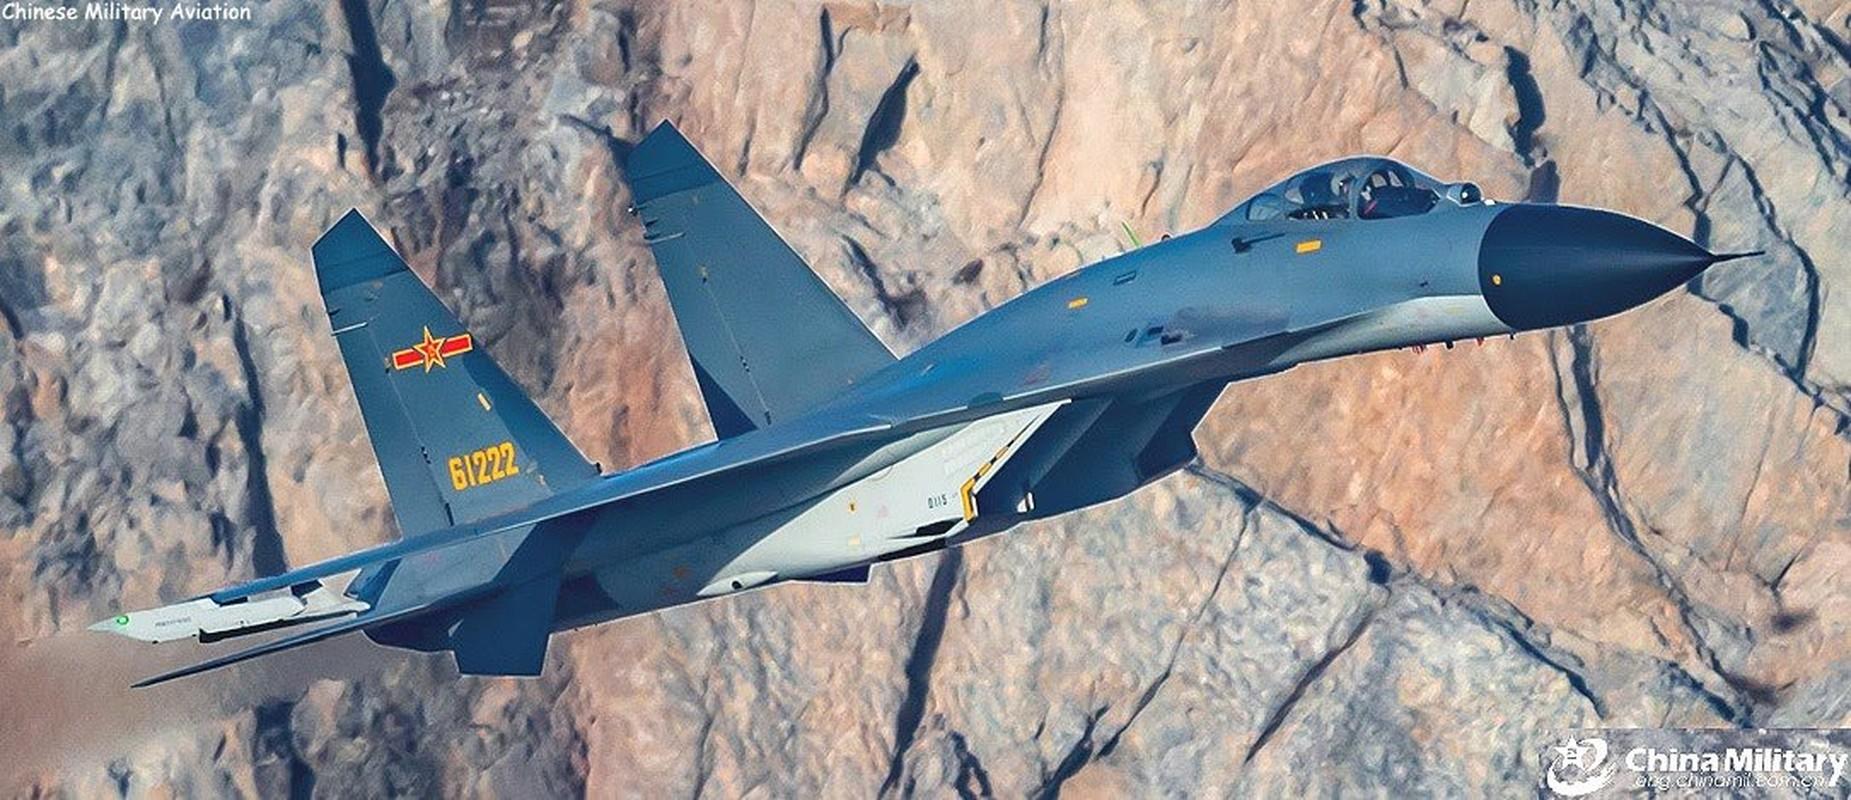 Trung Quoc khoe J-11 khien Nga phai hoi han vi trot ban Su-27-Hinh-15